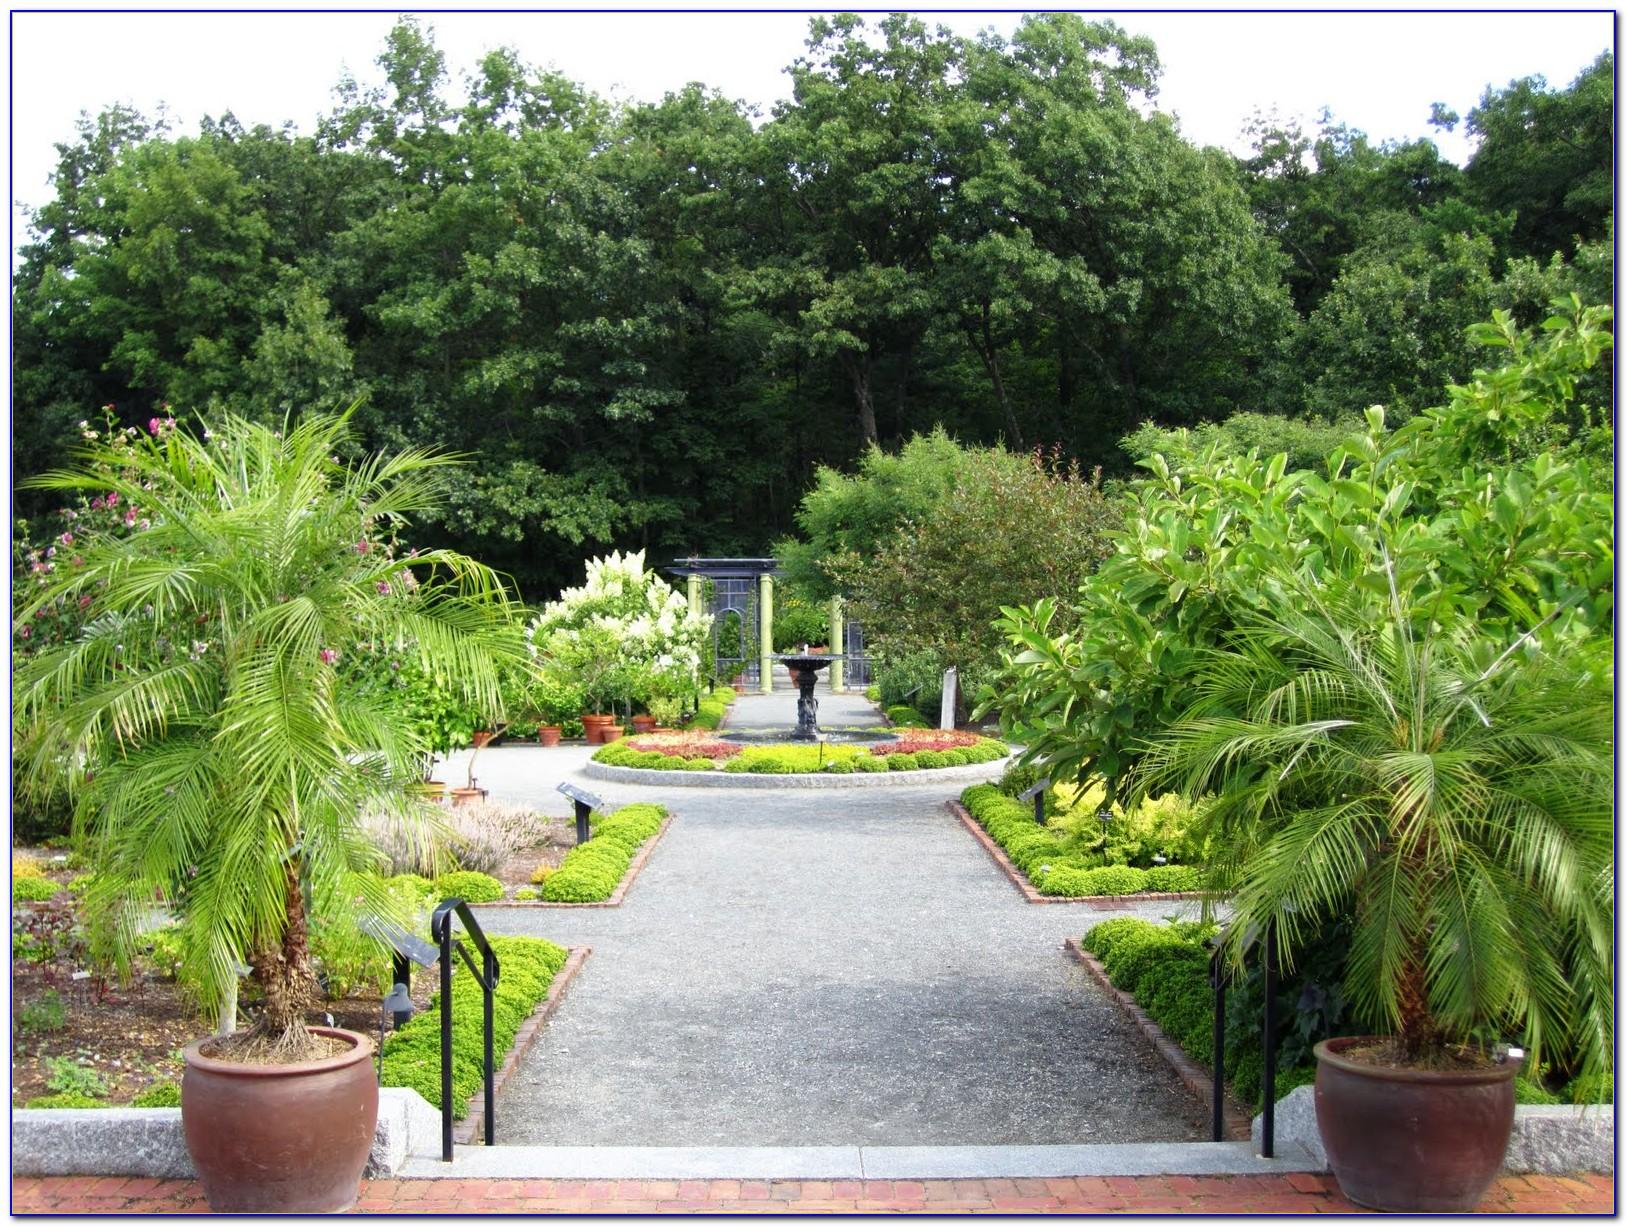 Tower Hill Botanic Garden Wedding Photos Download Page Home Design Ideas Galleries Home